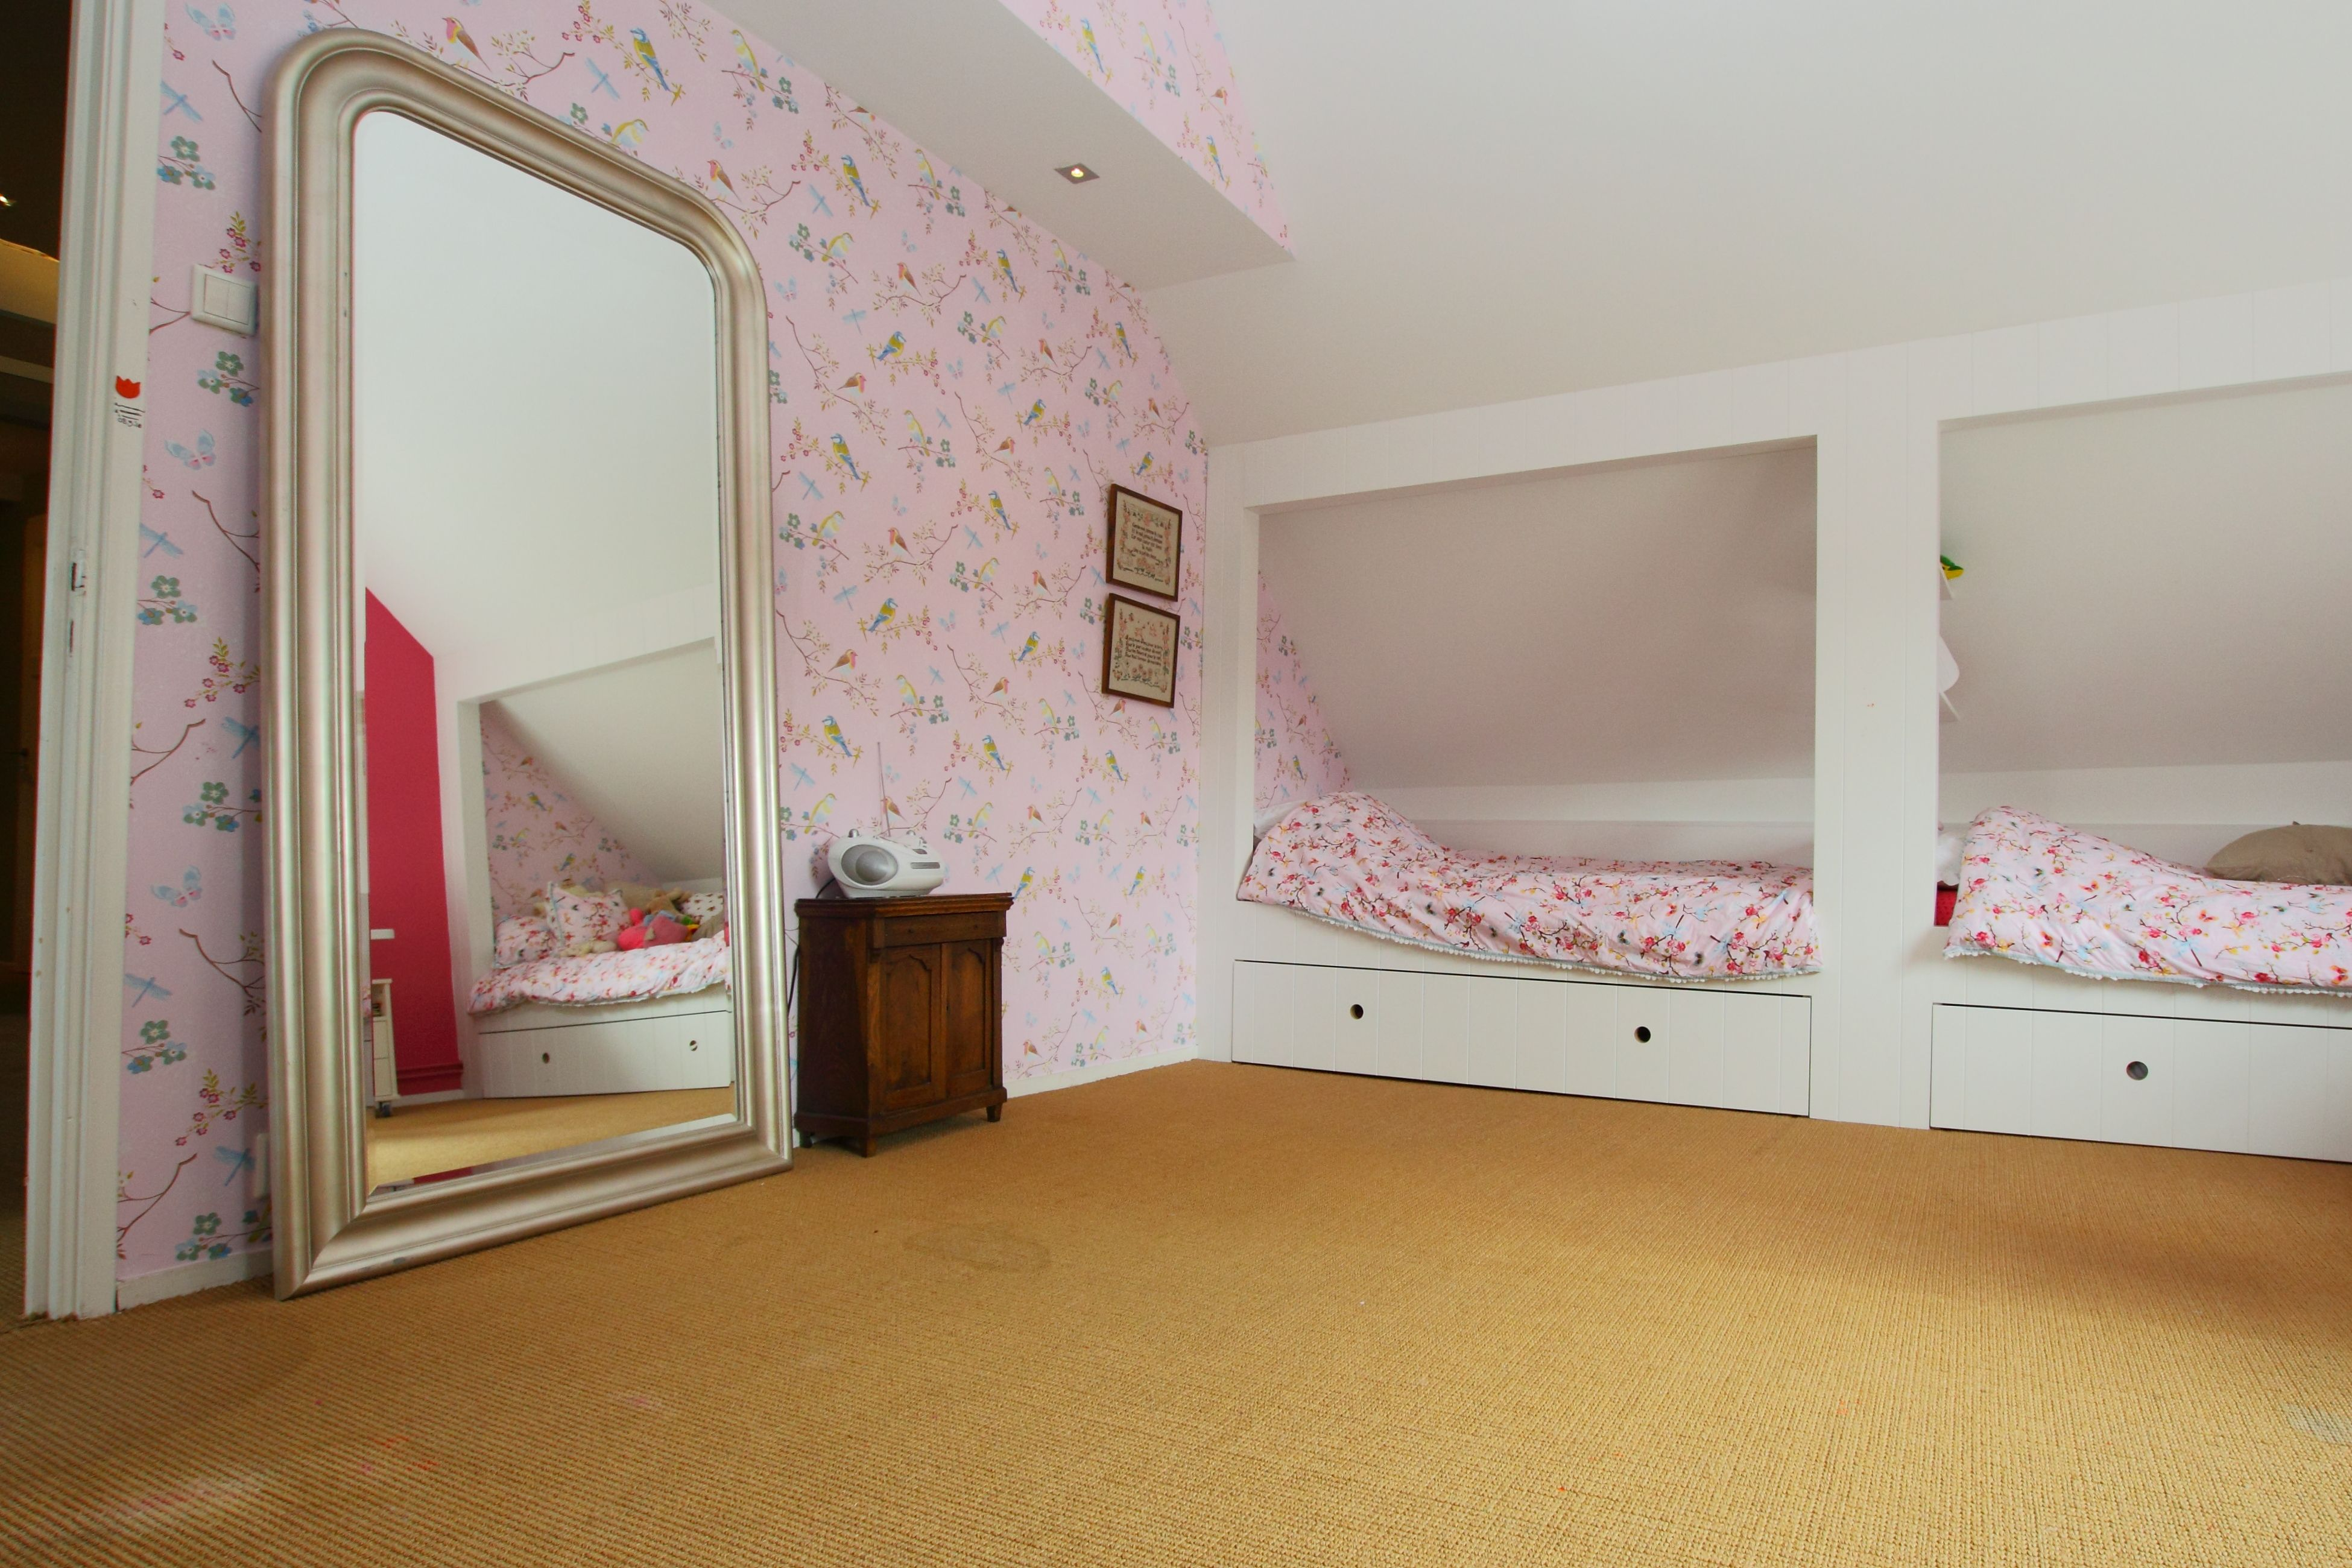 Meisjes kamer met pip behang en pip dekbedden met dubbele bestede